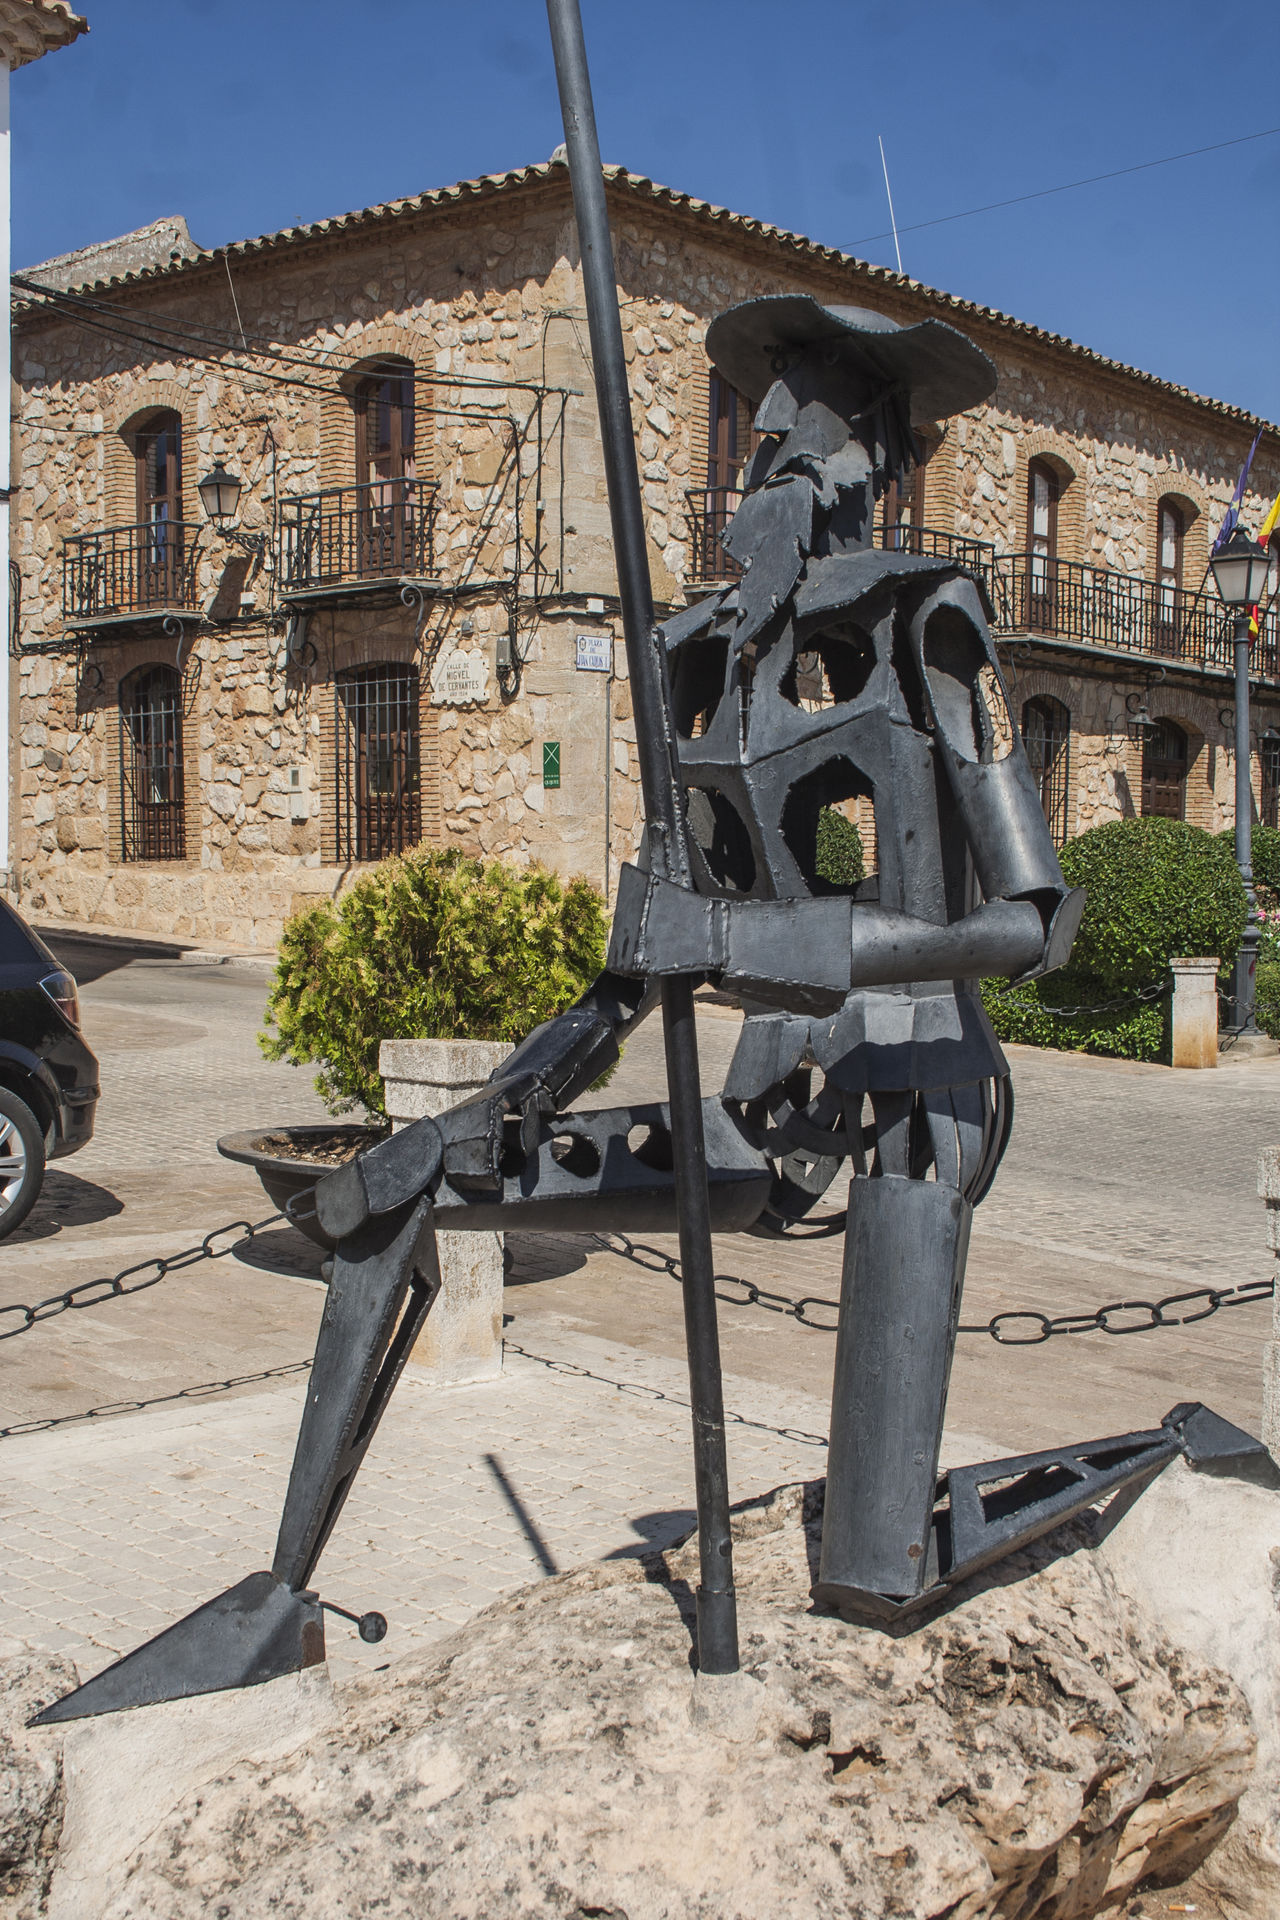 Architecture Building Exterior Built Structure Day Escultura Esculture Estatua Military No People Outdoors Quijote Quixote Sculpture SPAIN Toboso Toledo Spain War